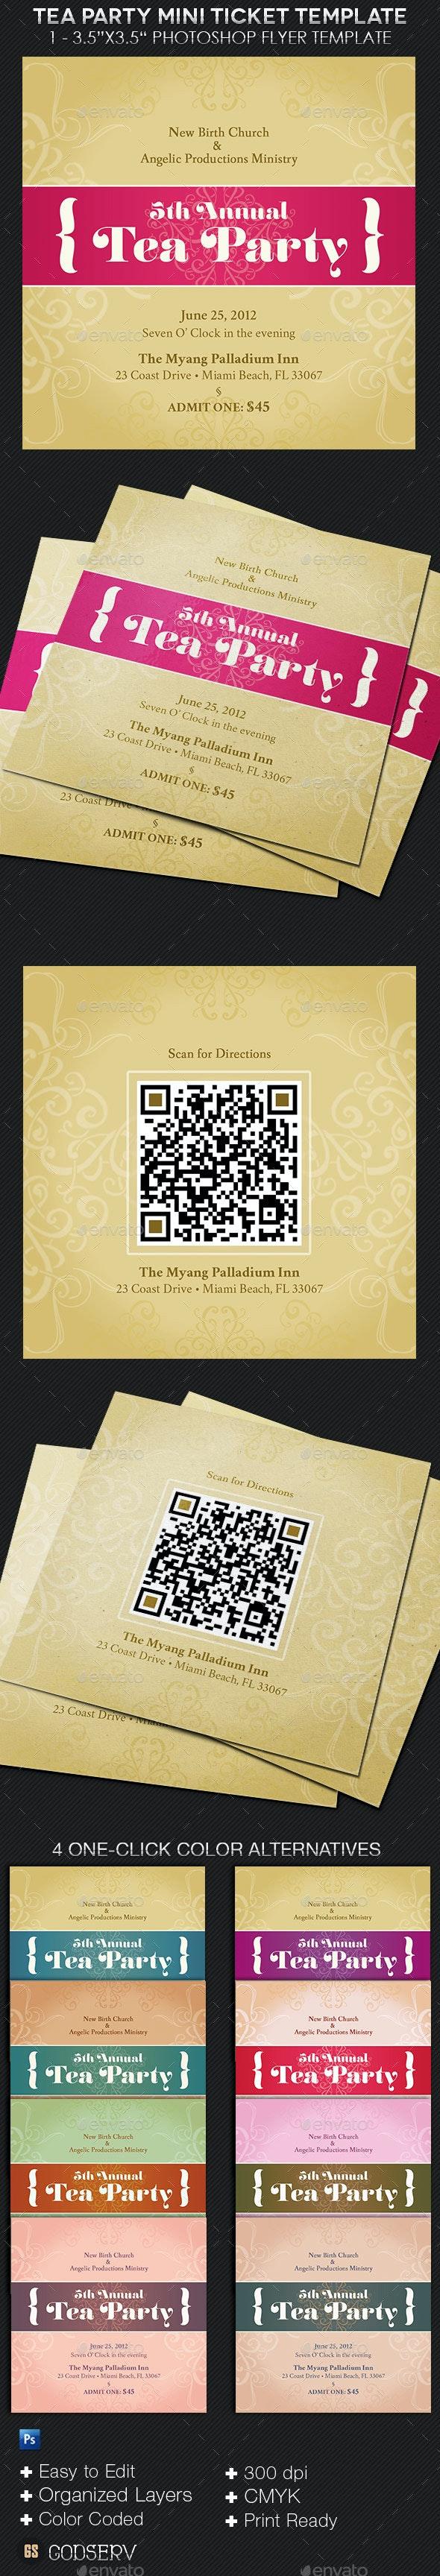 Tea Party Mini Ticket Template - Miscellaneous Print Templates